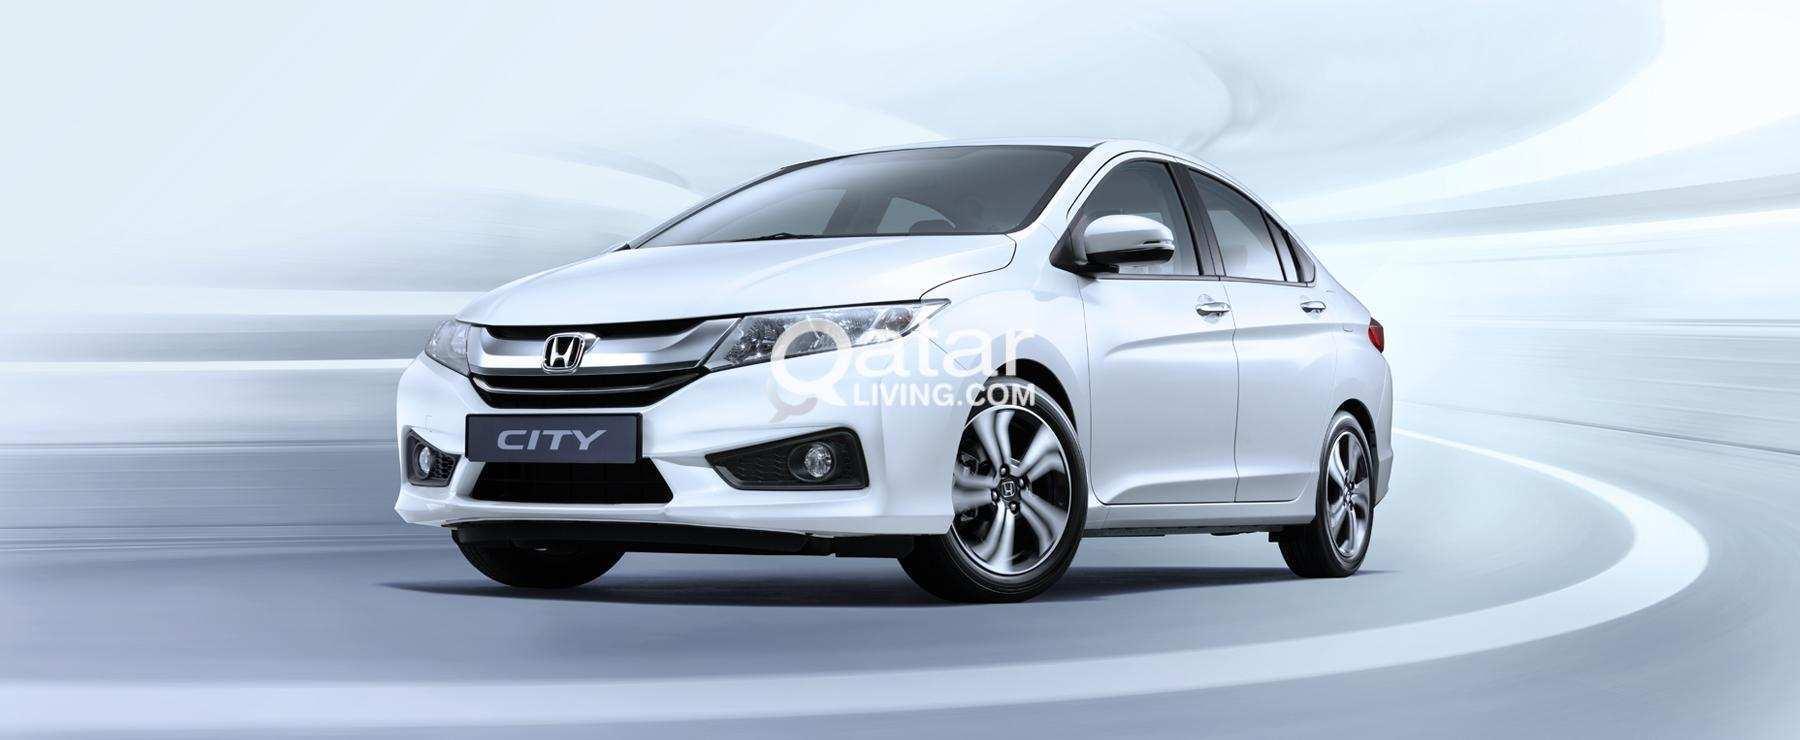 61 Concept of Honda City 2019 Qatar Price Reviews by Honda City 2019 Qatar Price